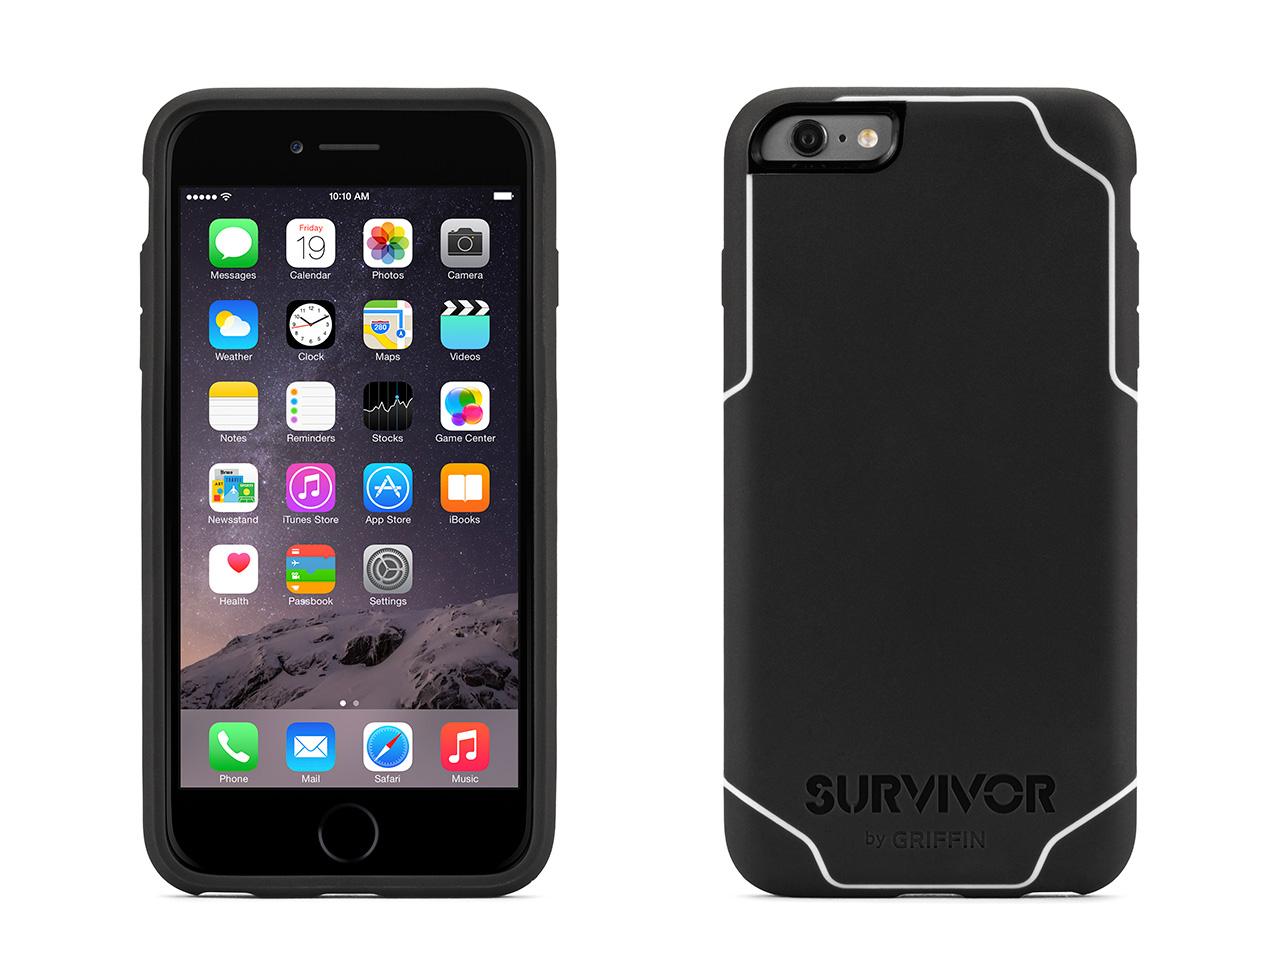 Iphone 6 Phone Cases: Griffin IPhone 6 Plus/6s Plus Protective Case Survivor